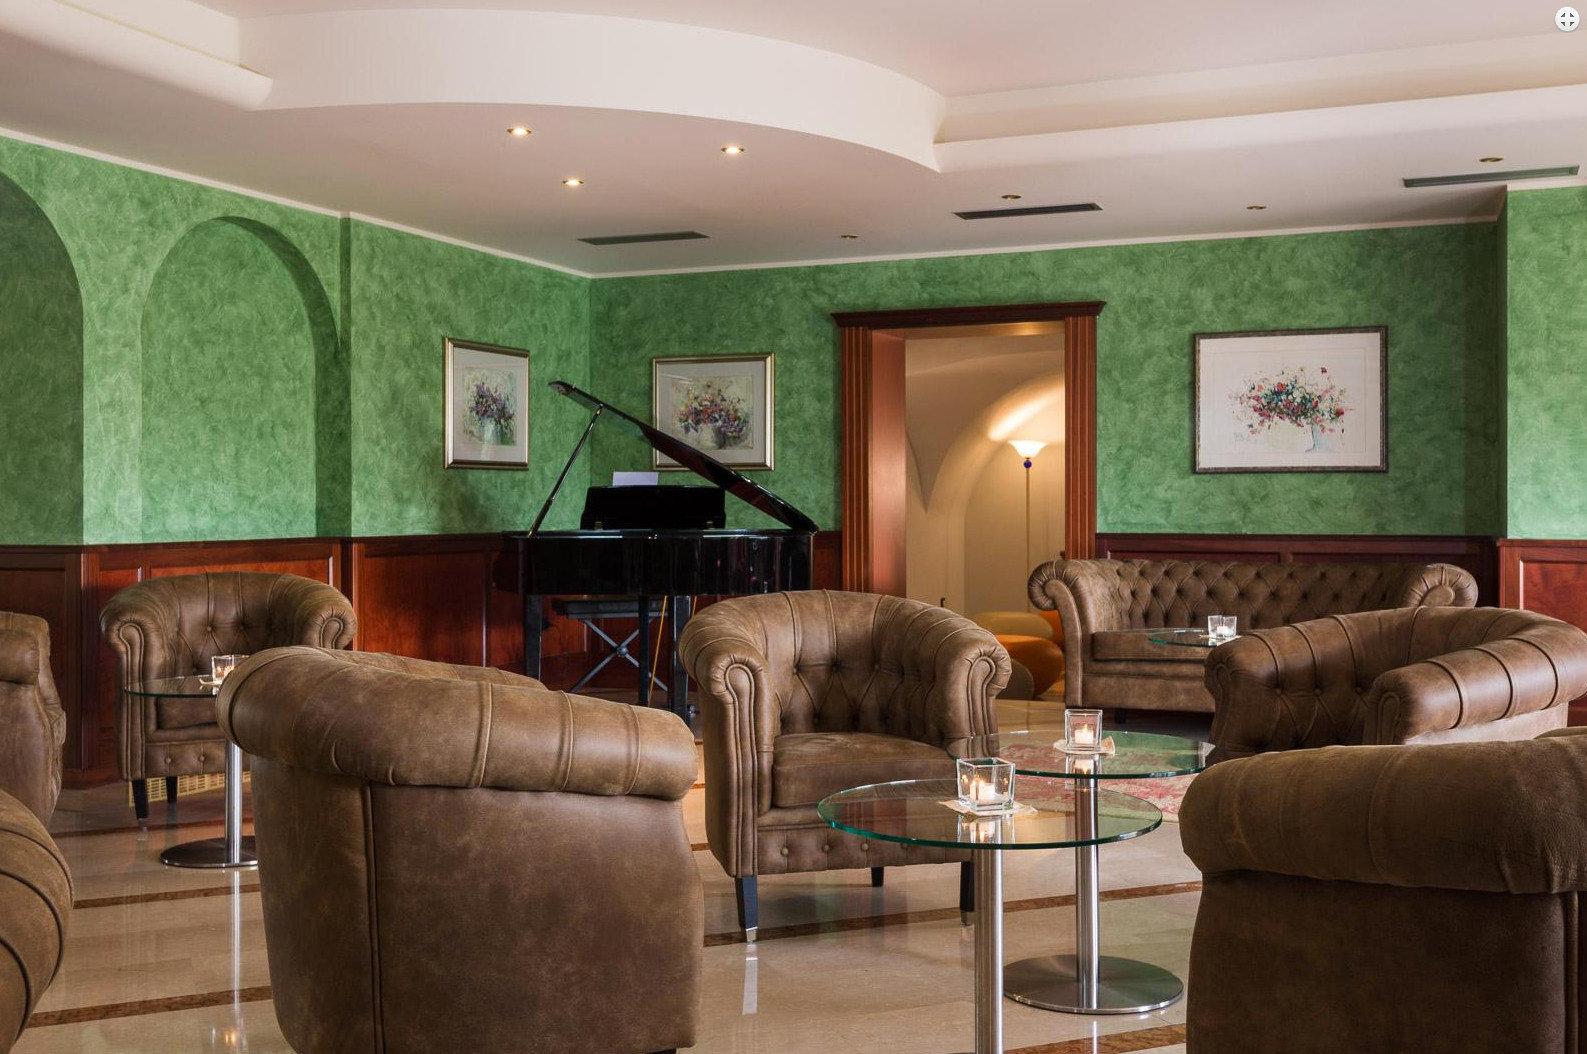 sofa property living room home green Lobby leather recreation room basement